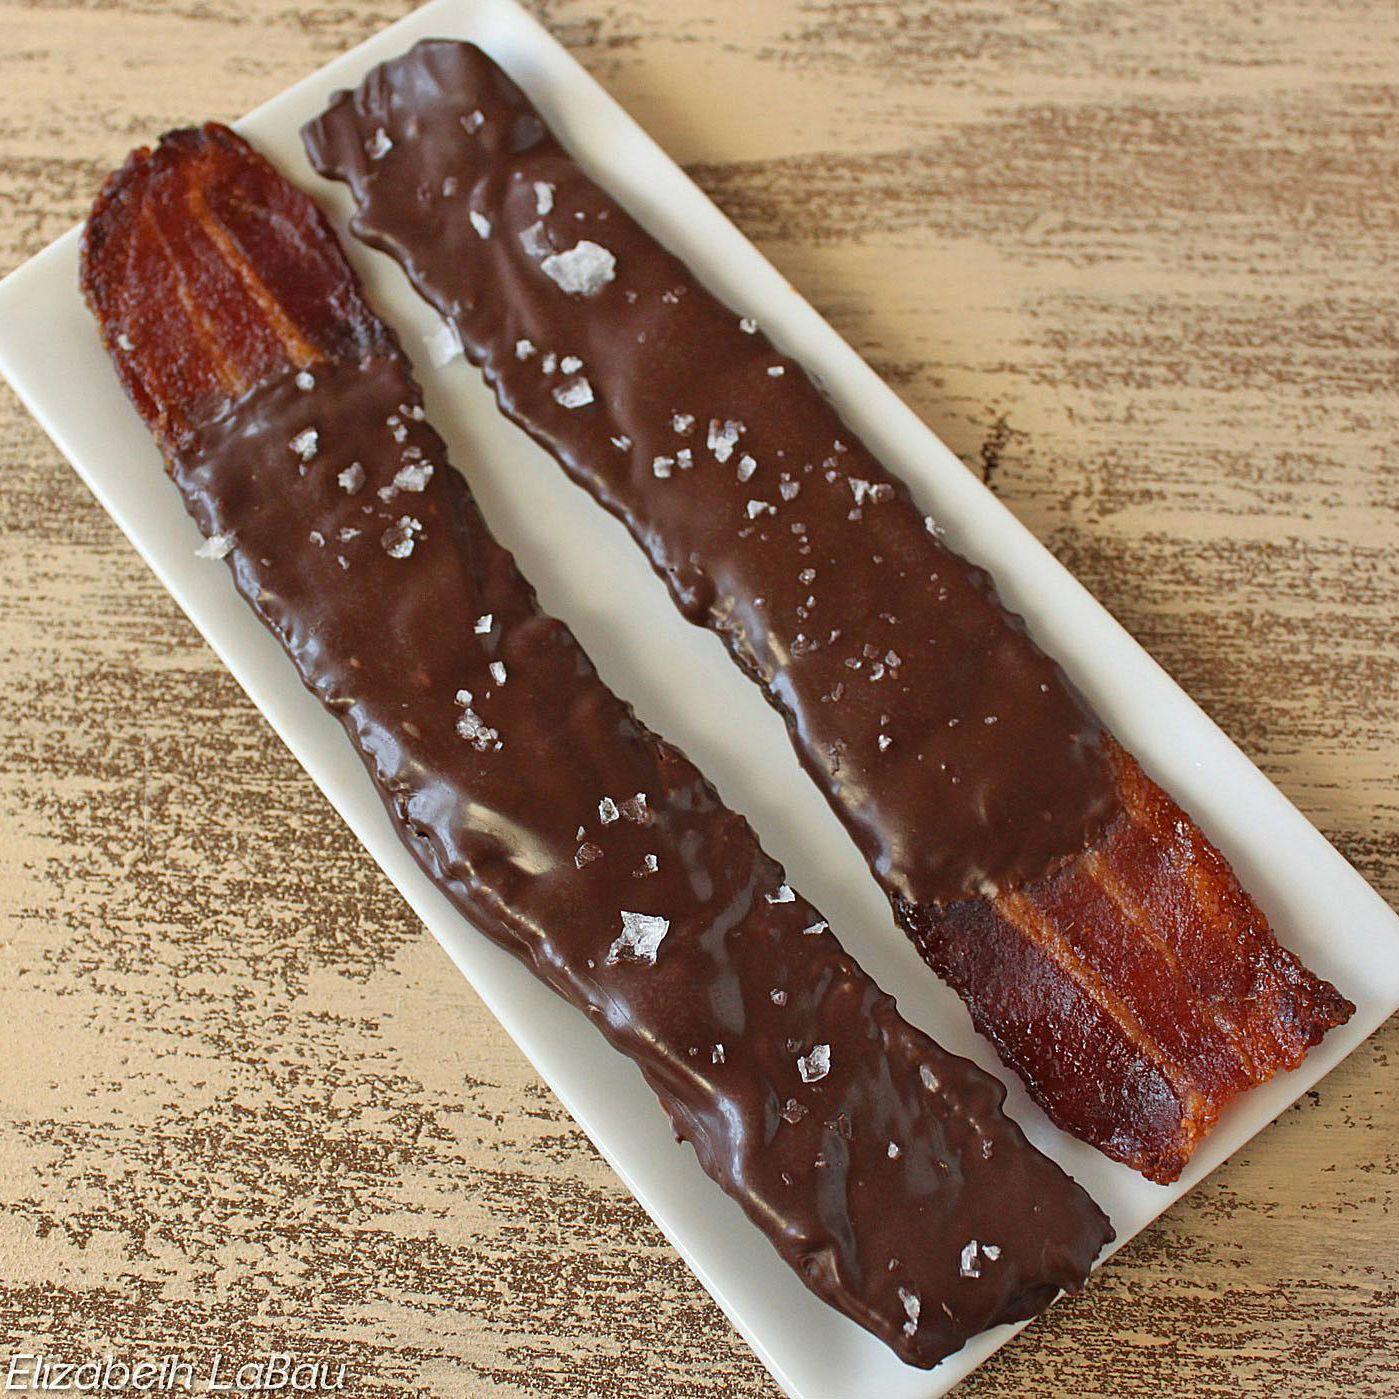 Comida cuqui fail: El tópic de los horrores fotogénicos culinarios - Página 5 Chocolate-covered-bacon-58ae09ac3df78c345b2af207